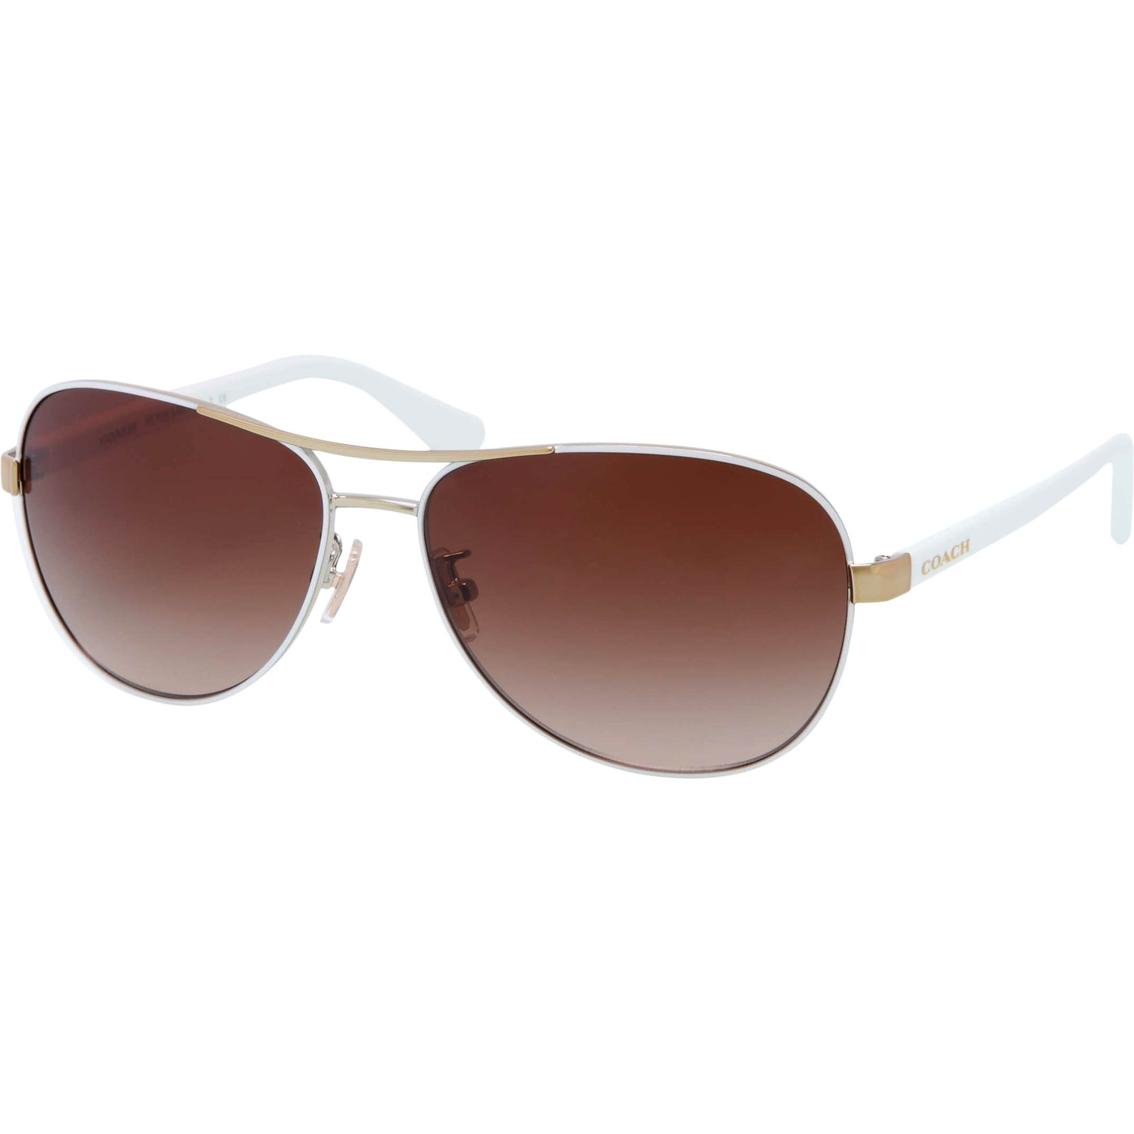 fd0a29abf1 ... buy coach sunglasses 0hc7038 fb776 3f6d8